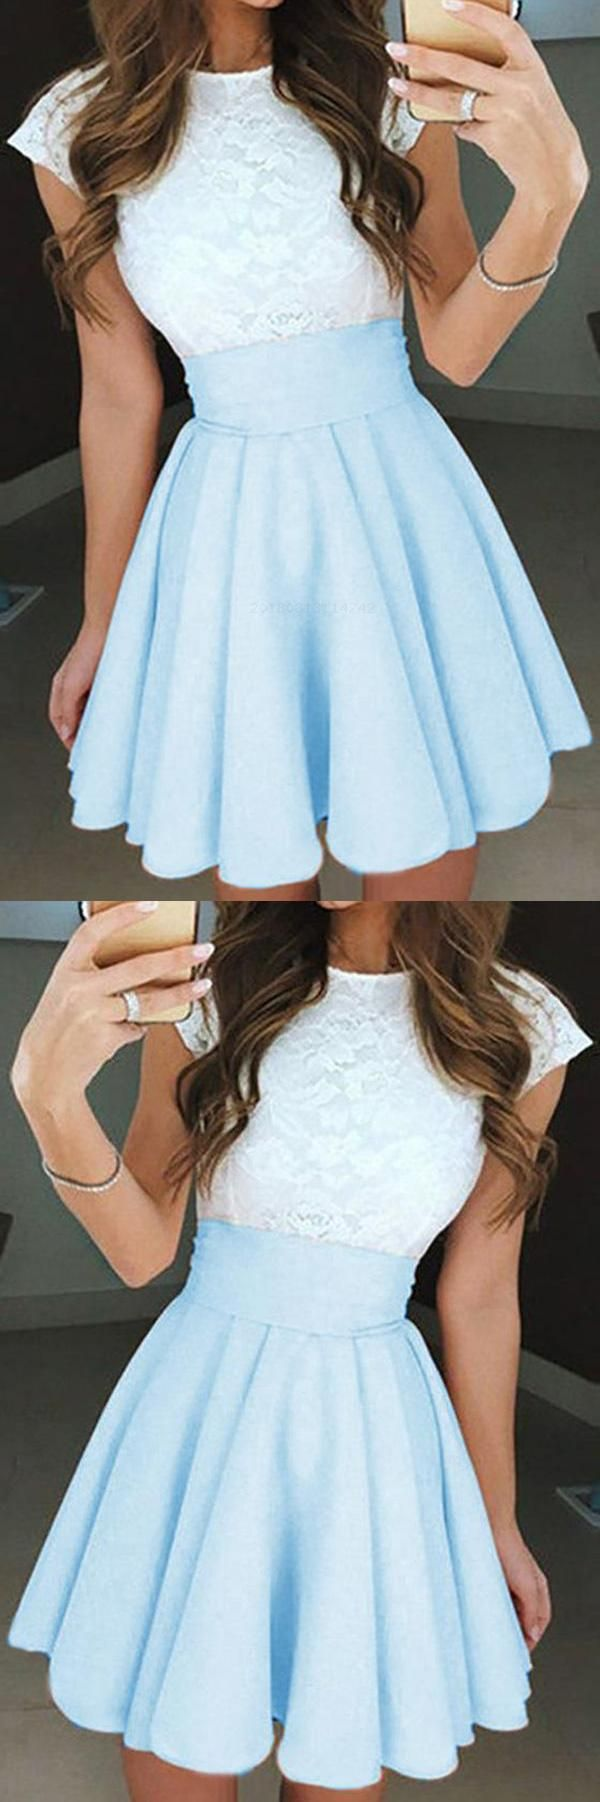 Customized trendy cute homecoming dress homecoming dress aline